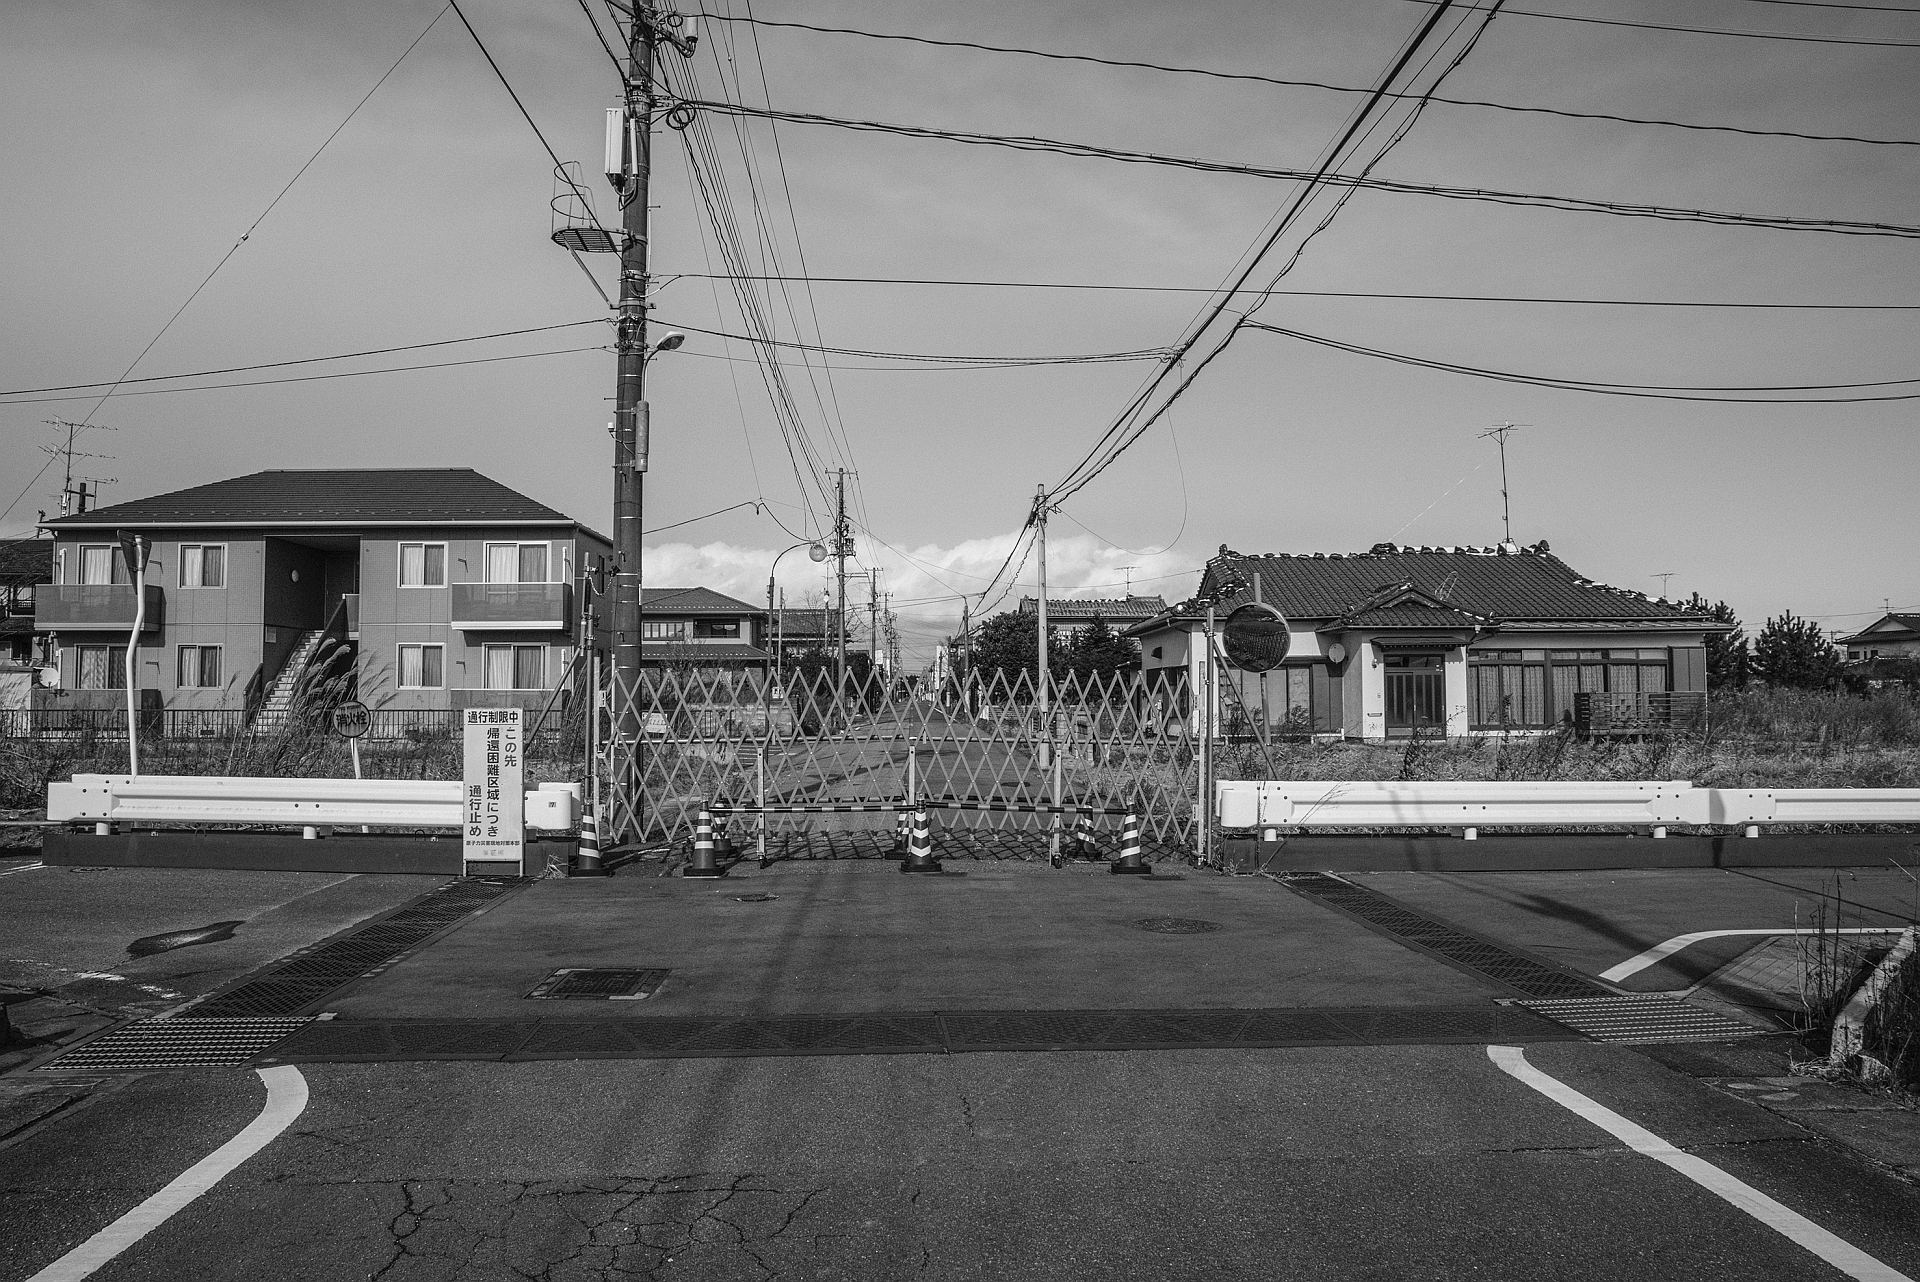 02 – Street closed